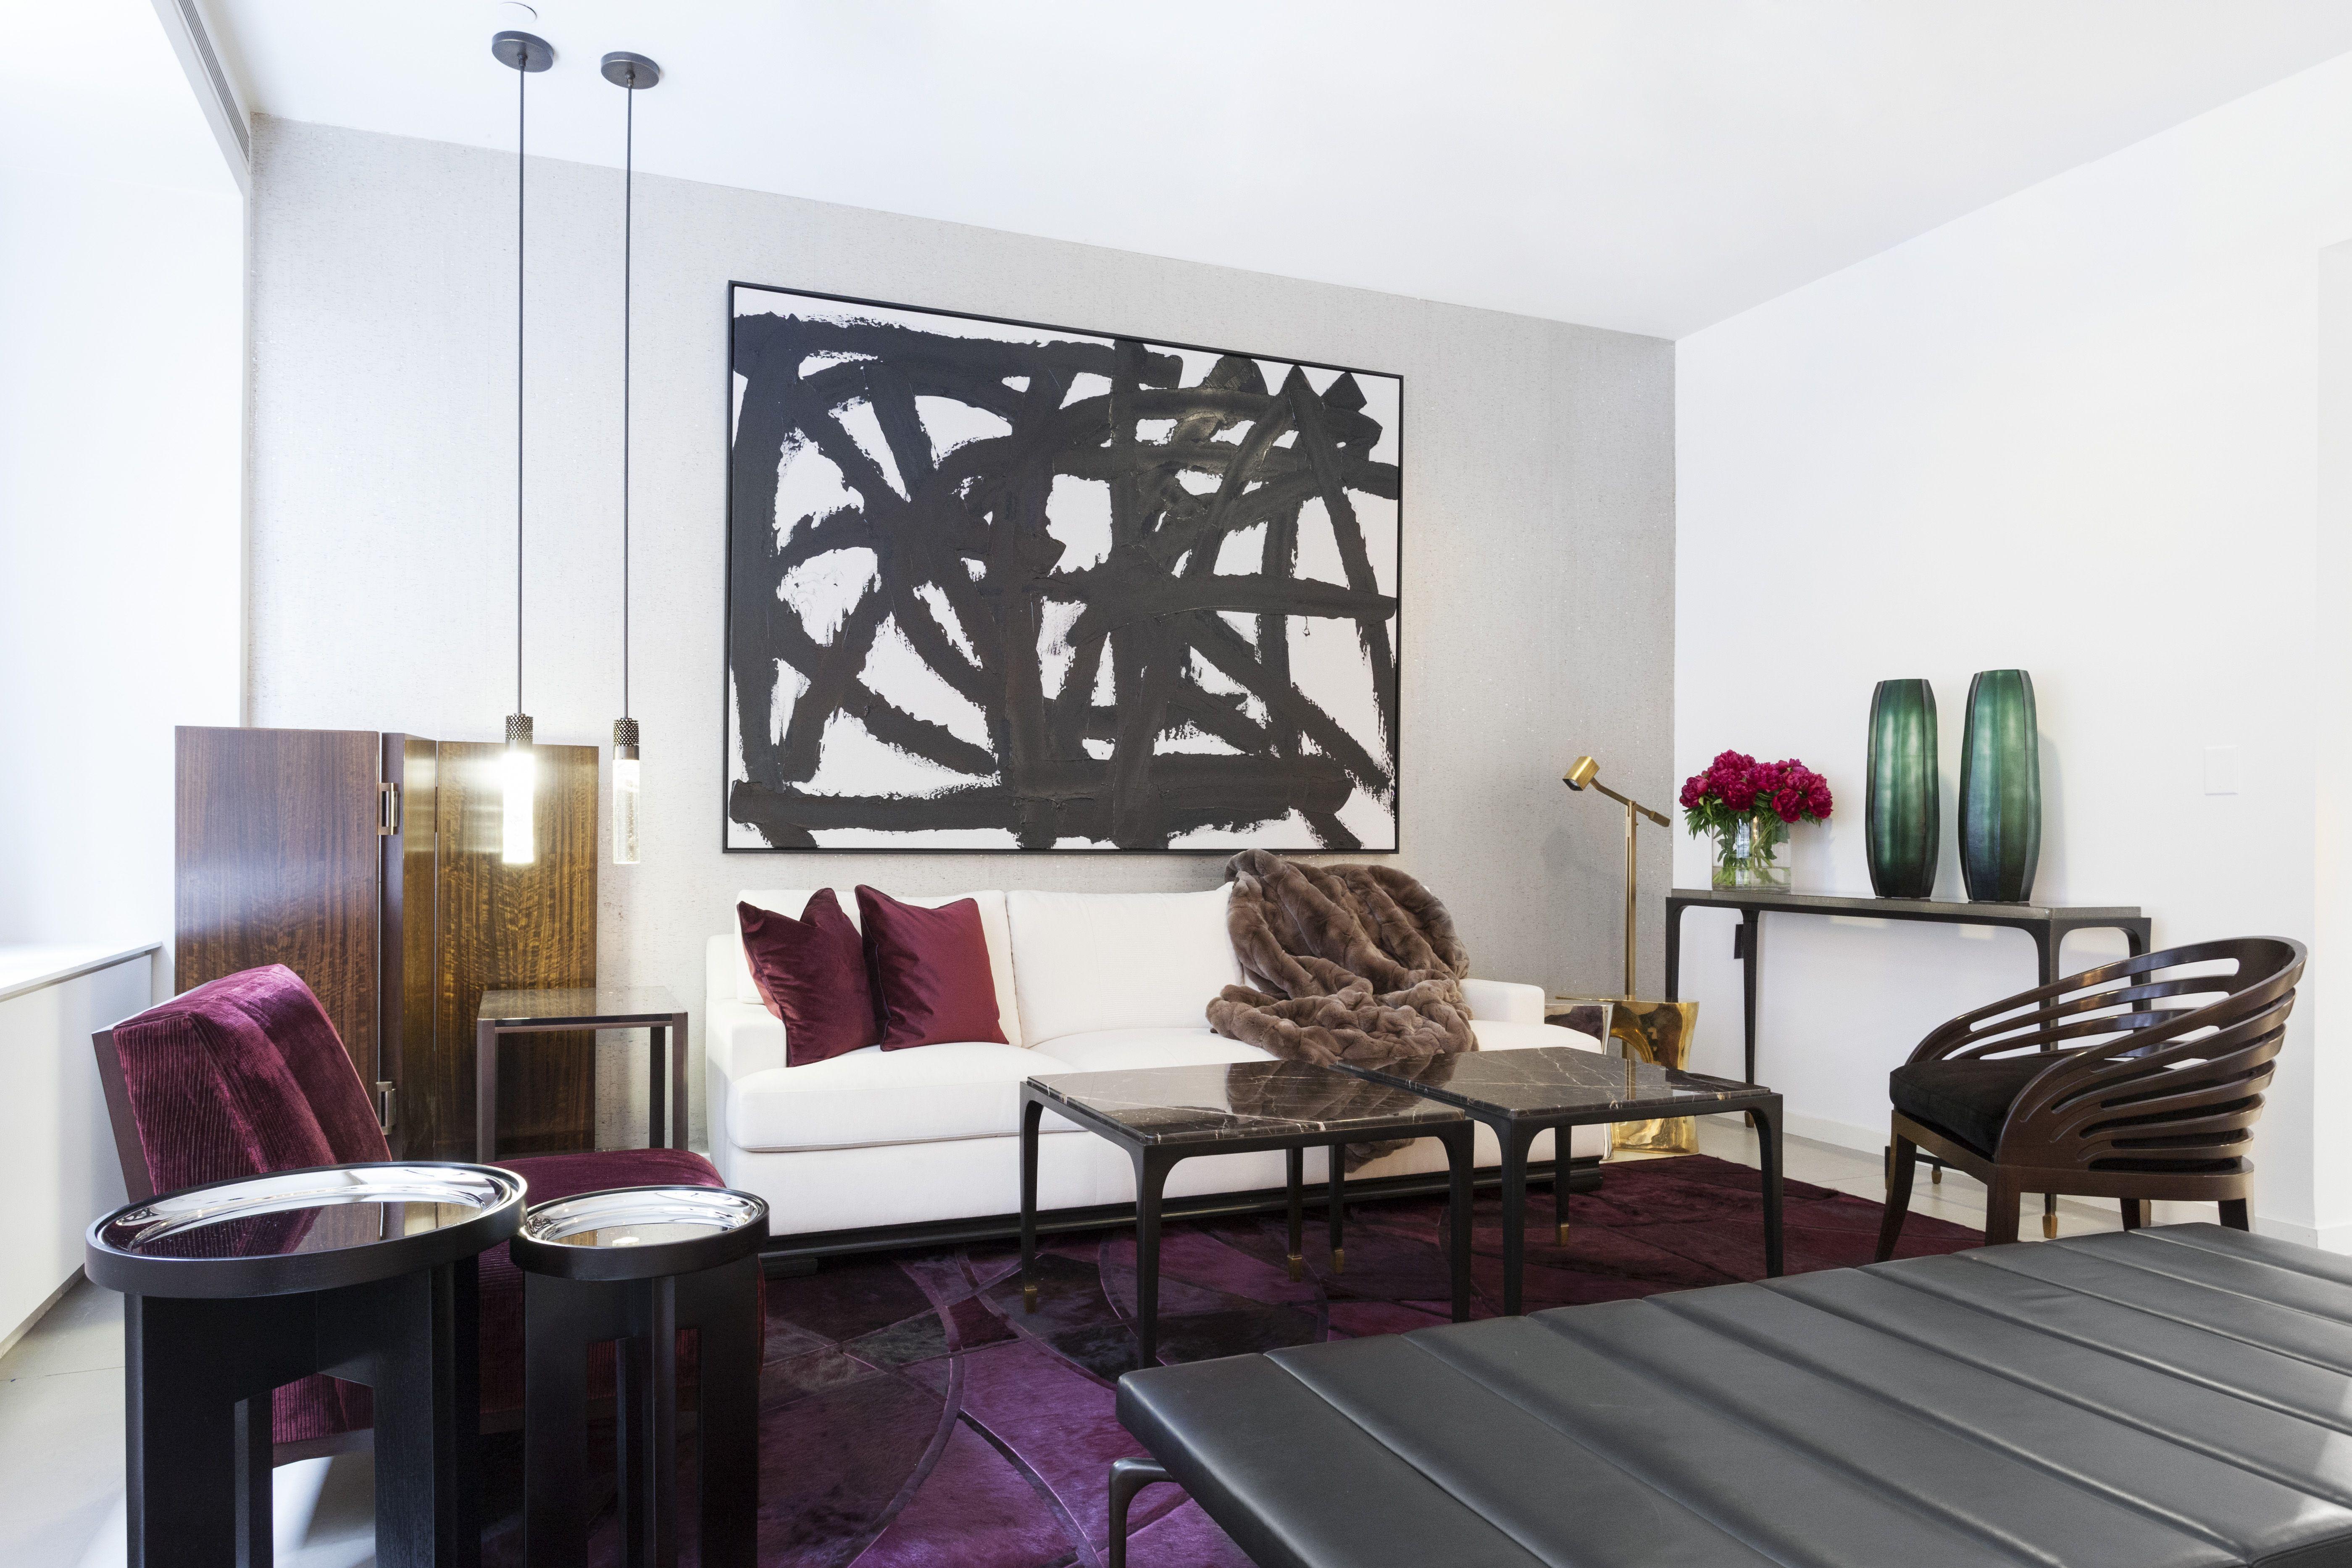 Livingroom Interiordesign Living Room Interior Design Room